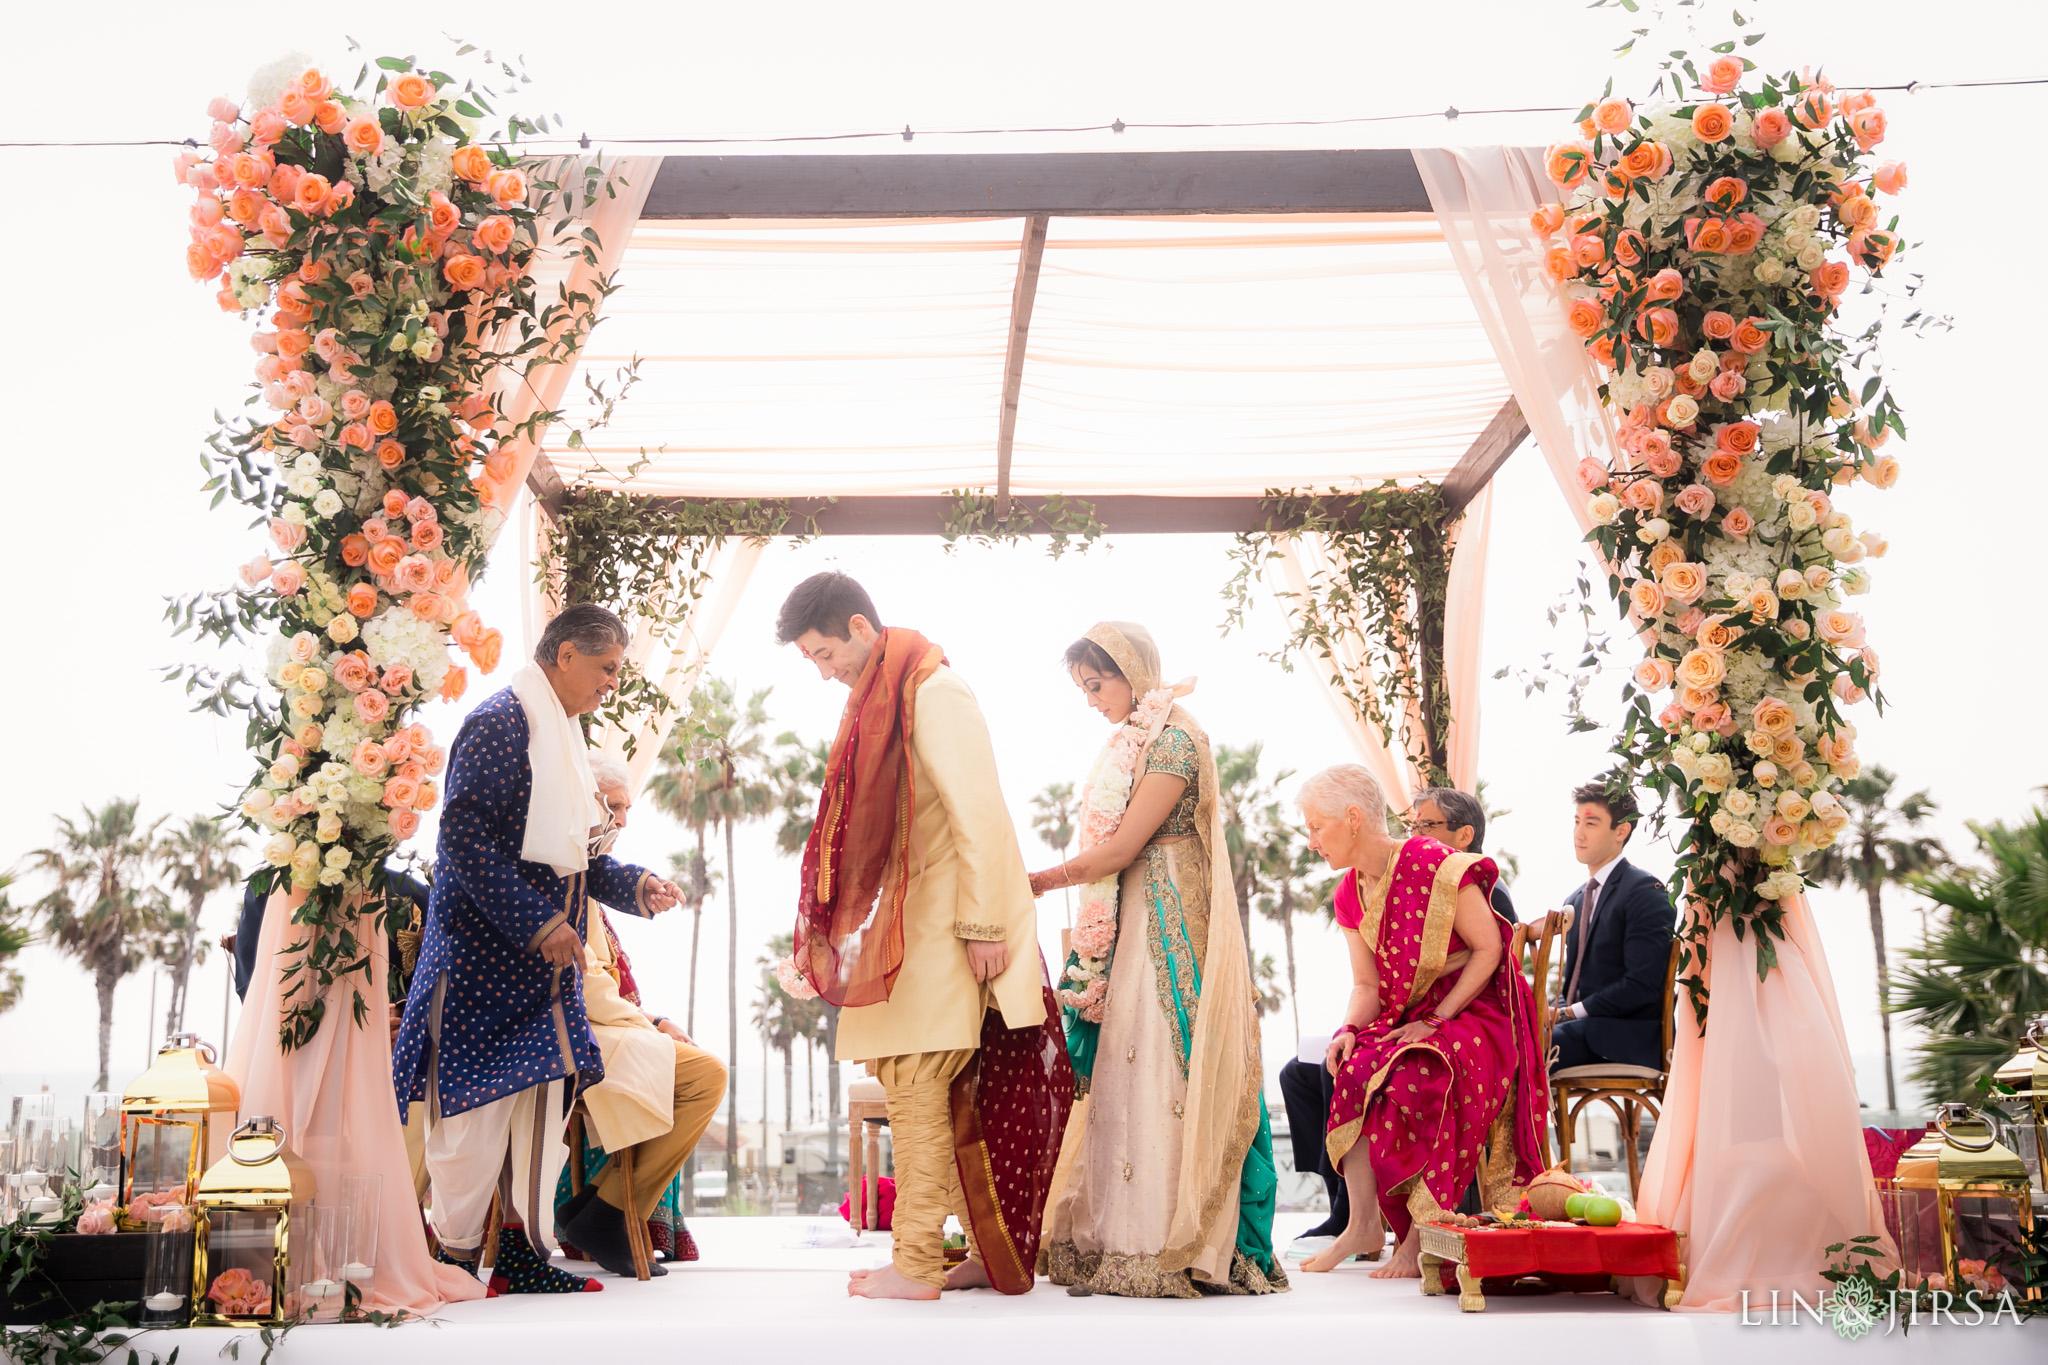 30 pasea hotel and spa huntington beach indian wedding ceremony photography